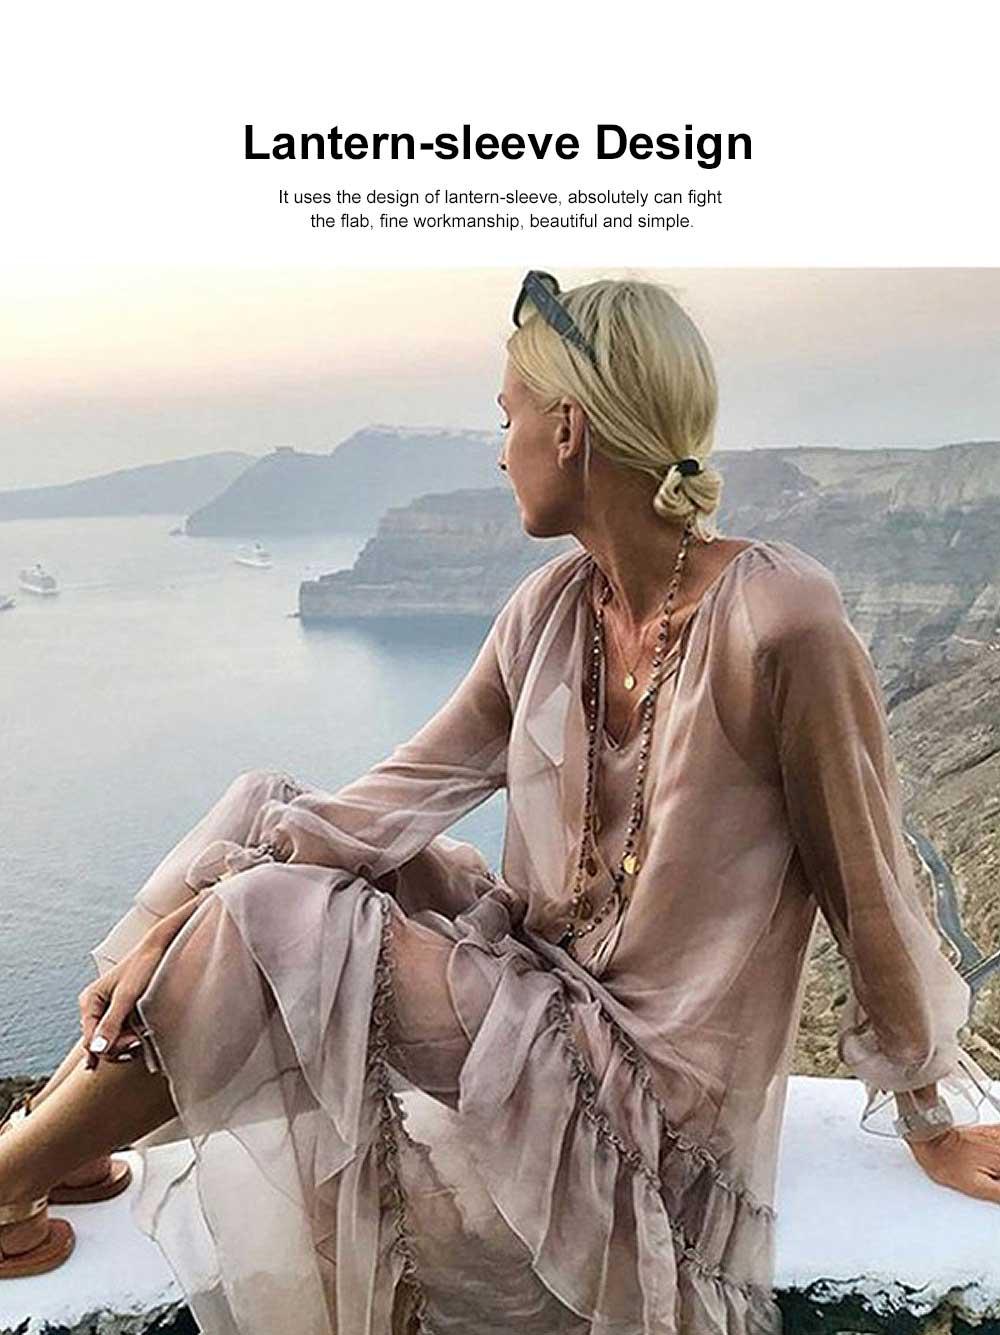 V-neck Ruffled Long-sleeve Resort Boho Dress for Vocation, Bohemian Long Dress, Lantern Sleeve Lotus Leaf Dress Hem Combination Design for Summer Autumn Dress 2019 1